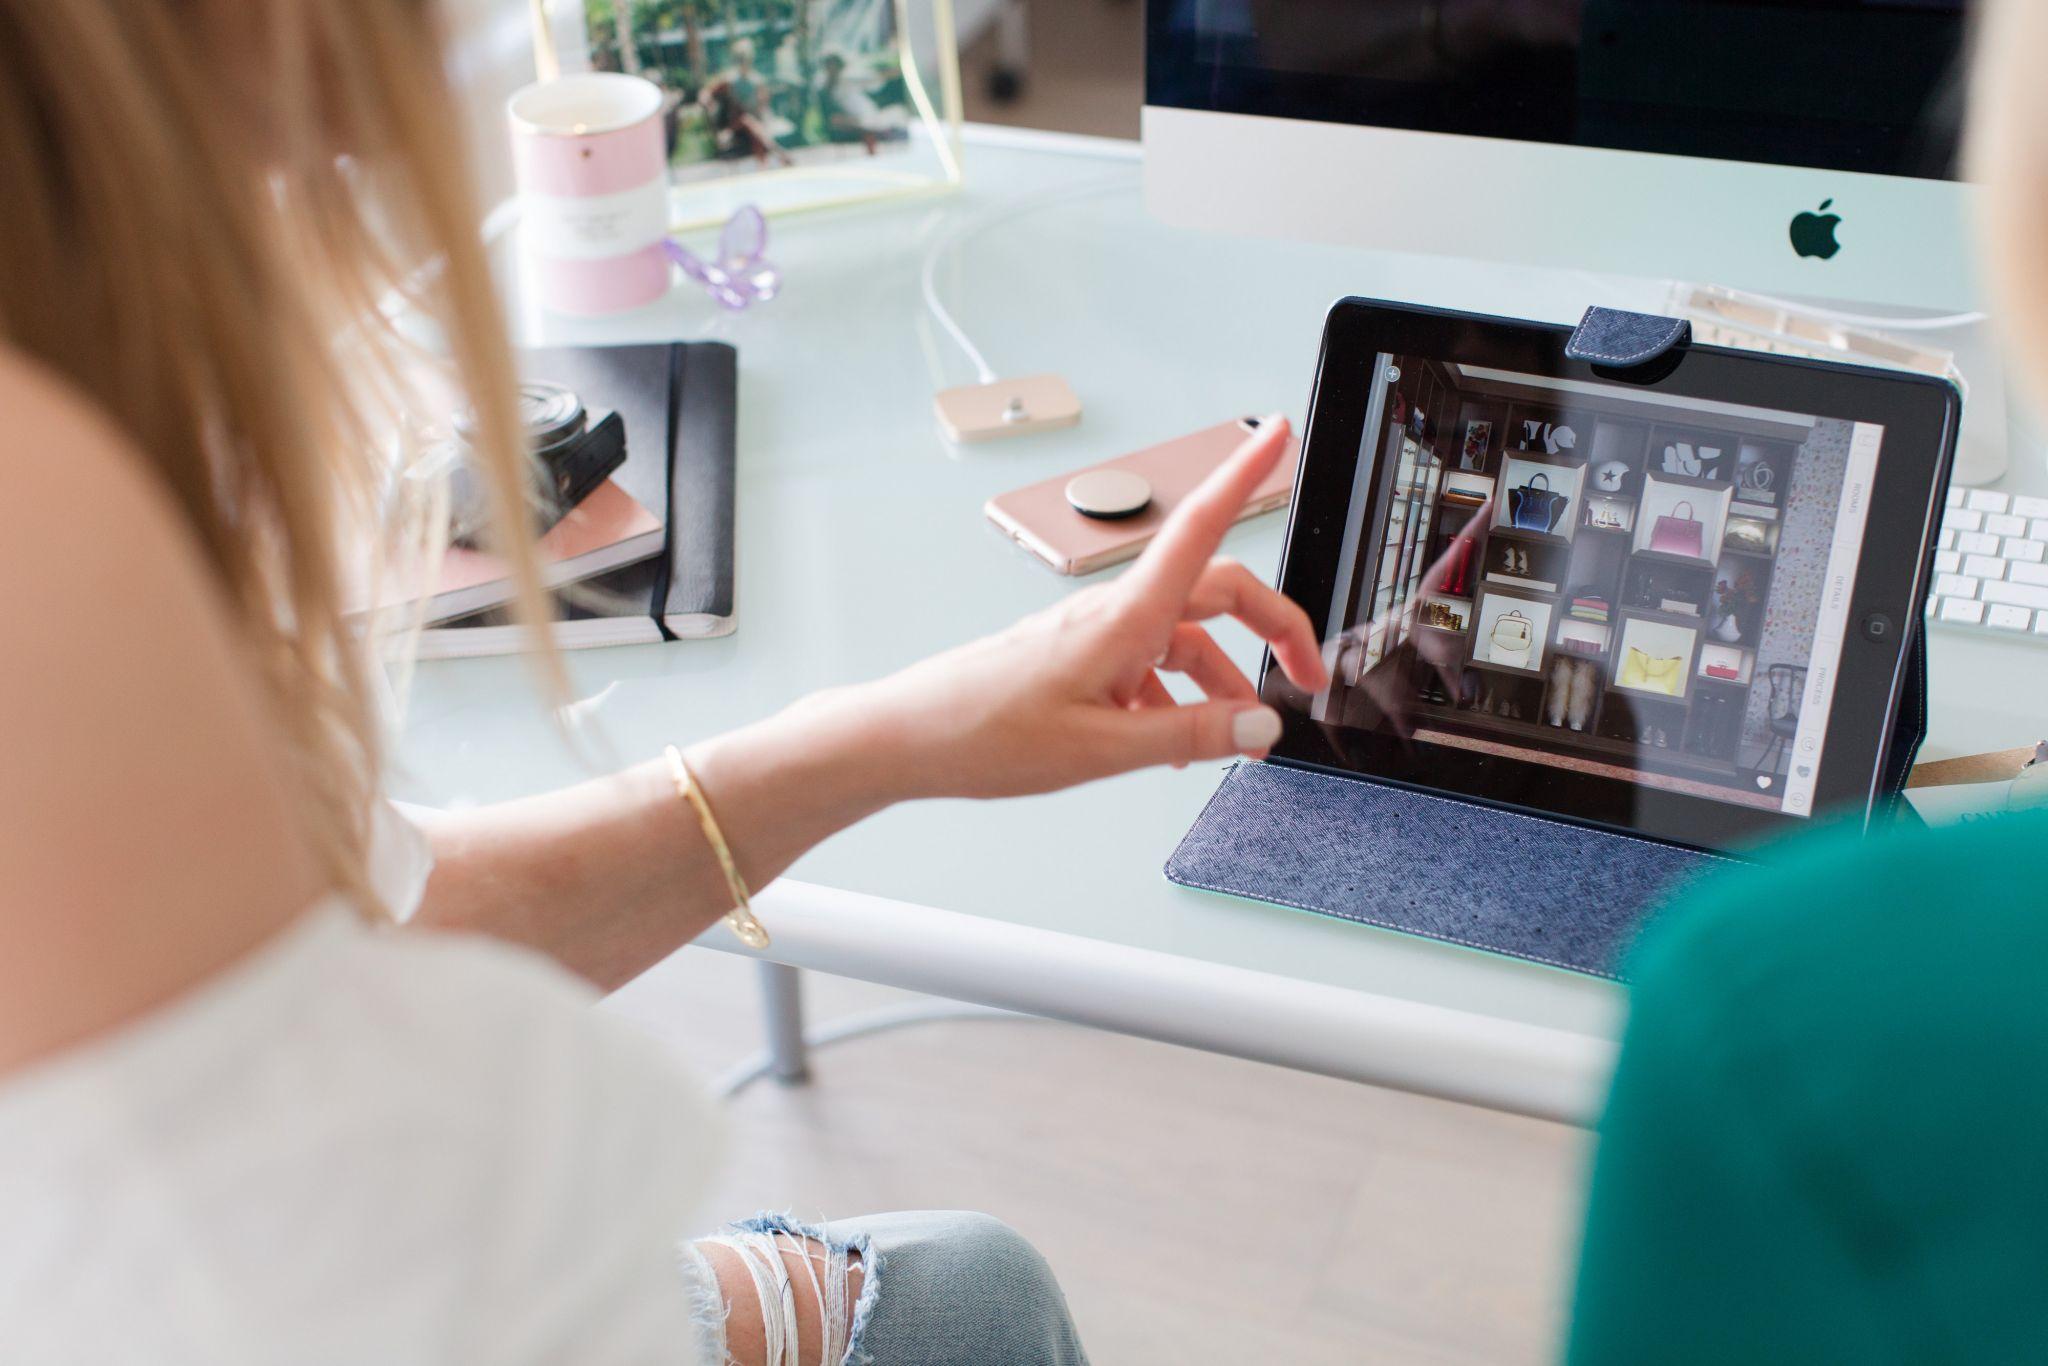 2 girls sitting at a computer desk, California closet design consultation, iPad with example of closet options